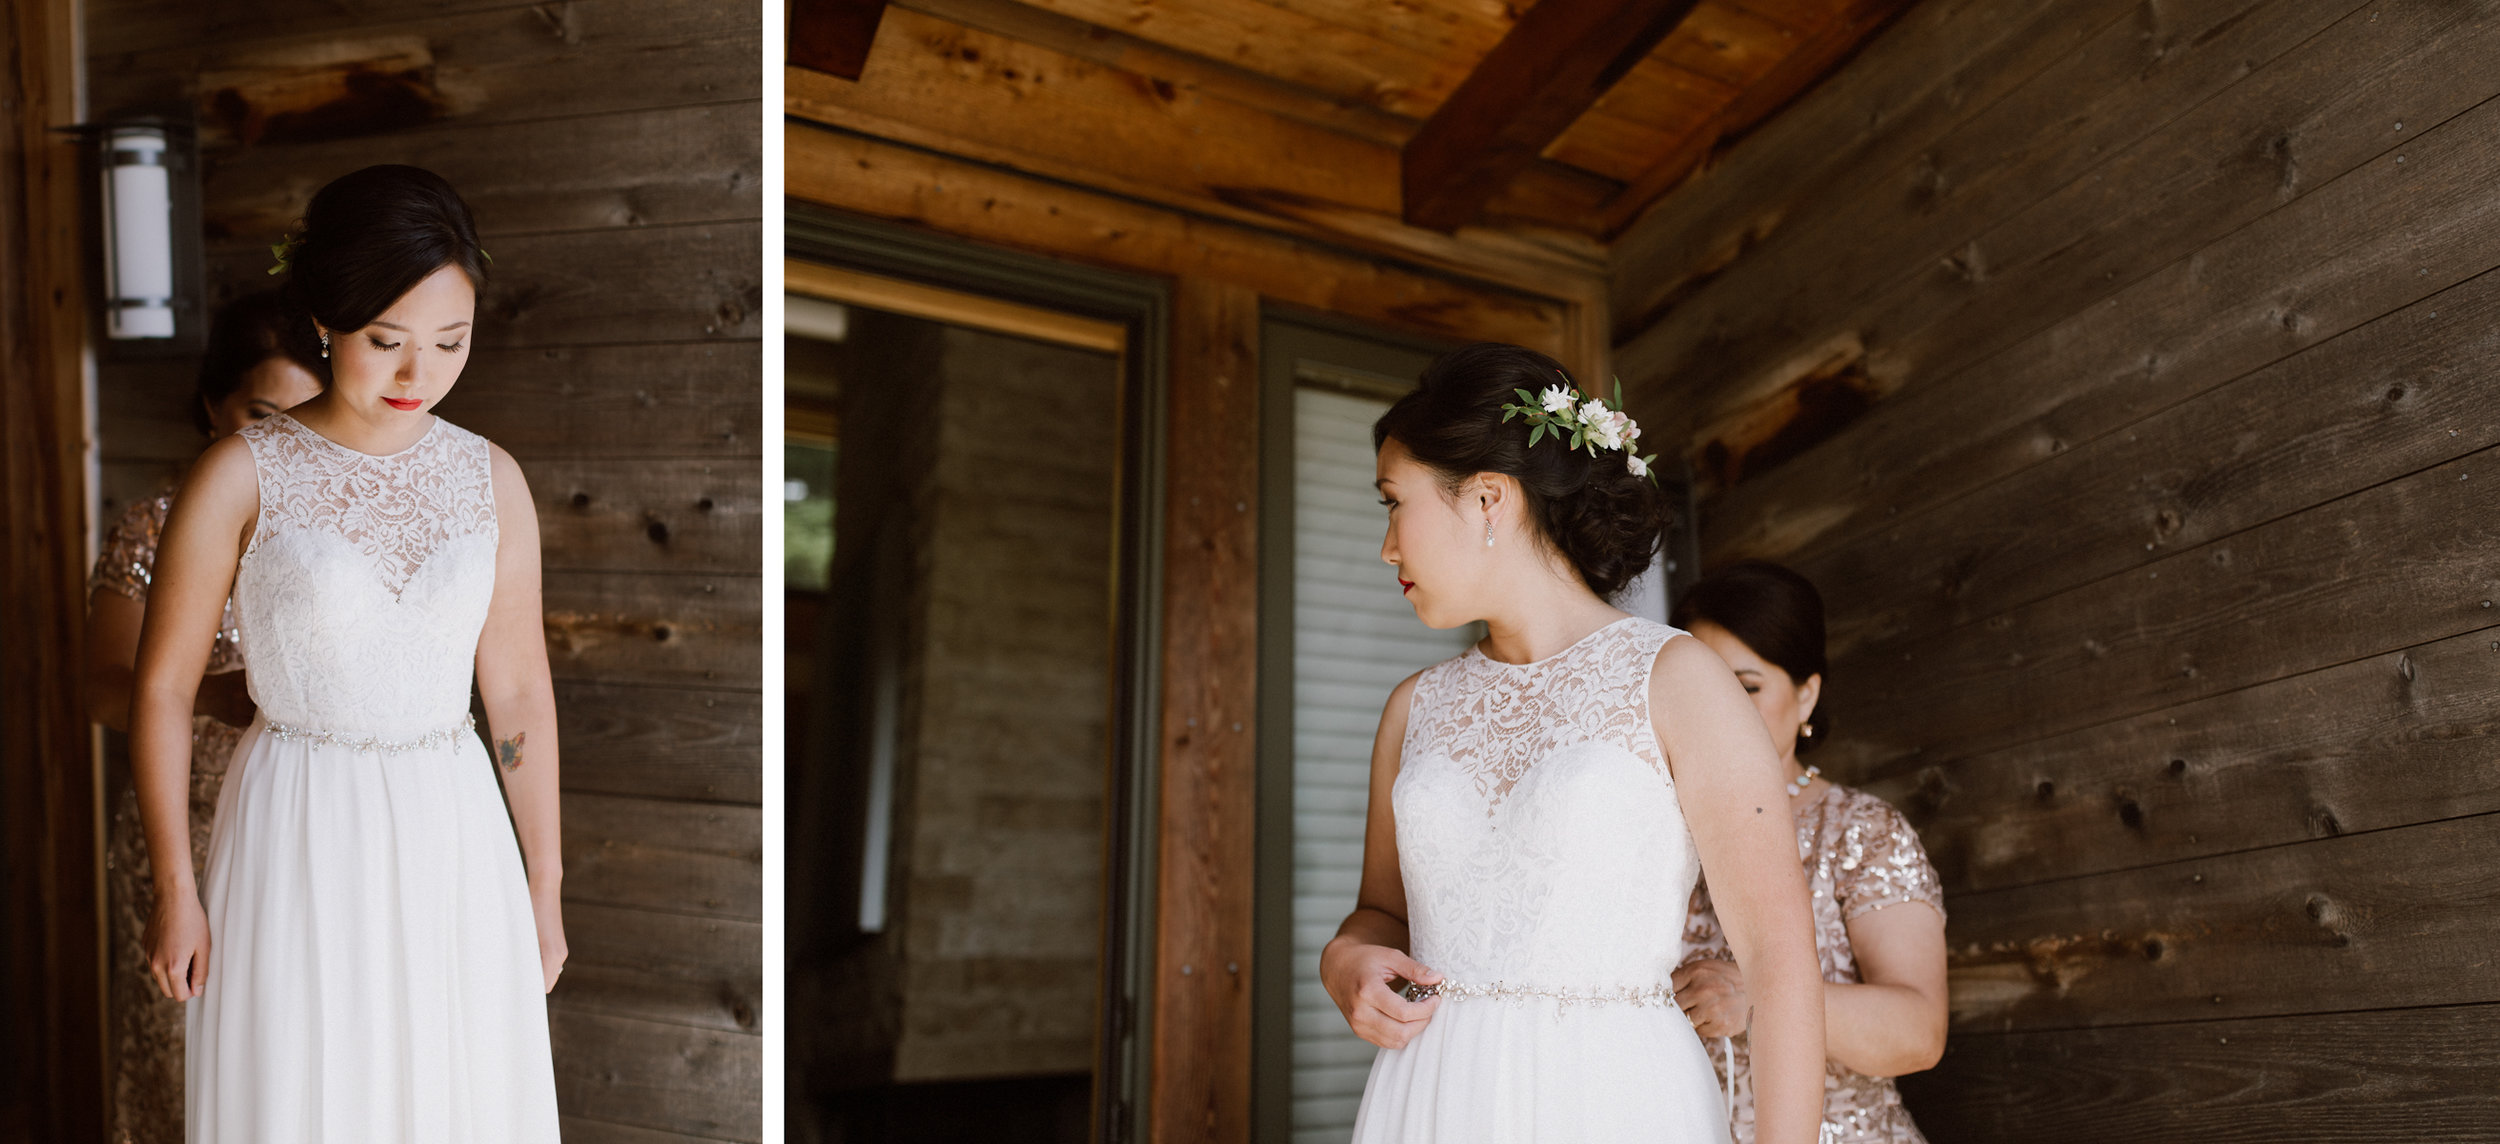 Bride & Groom getting ready at the Ventana Inn, Big Sur.